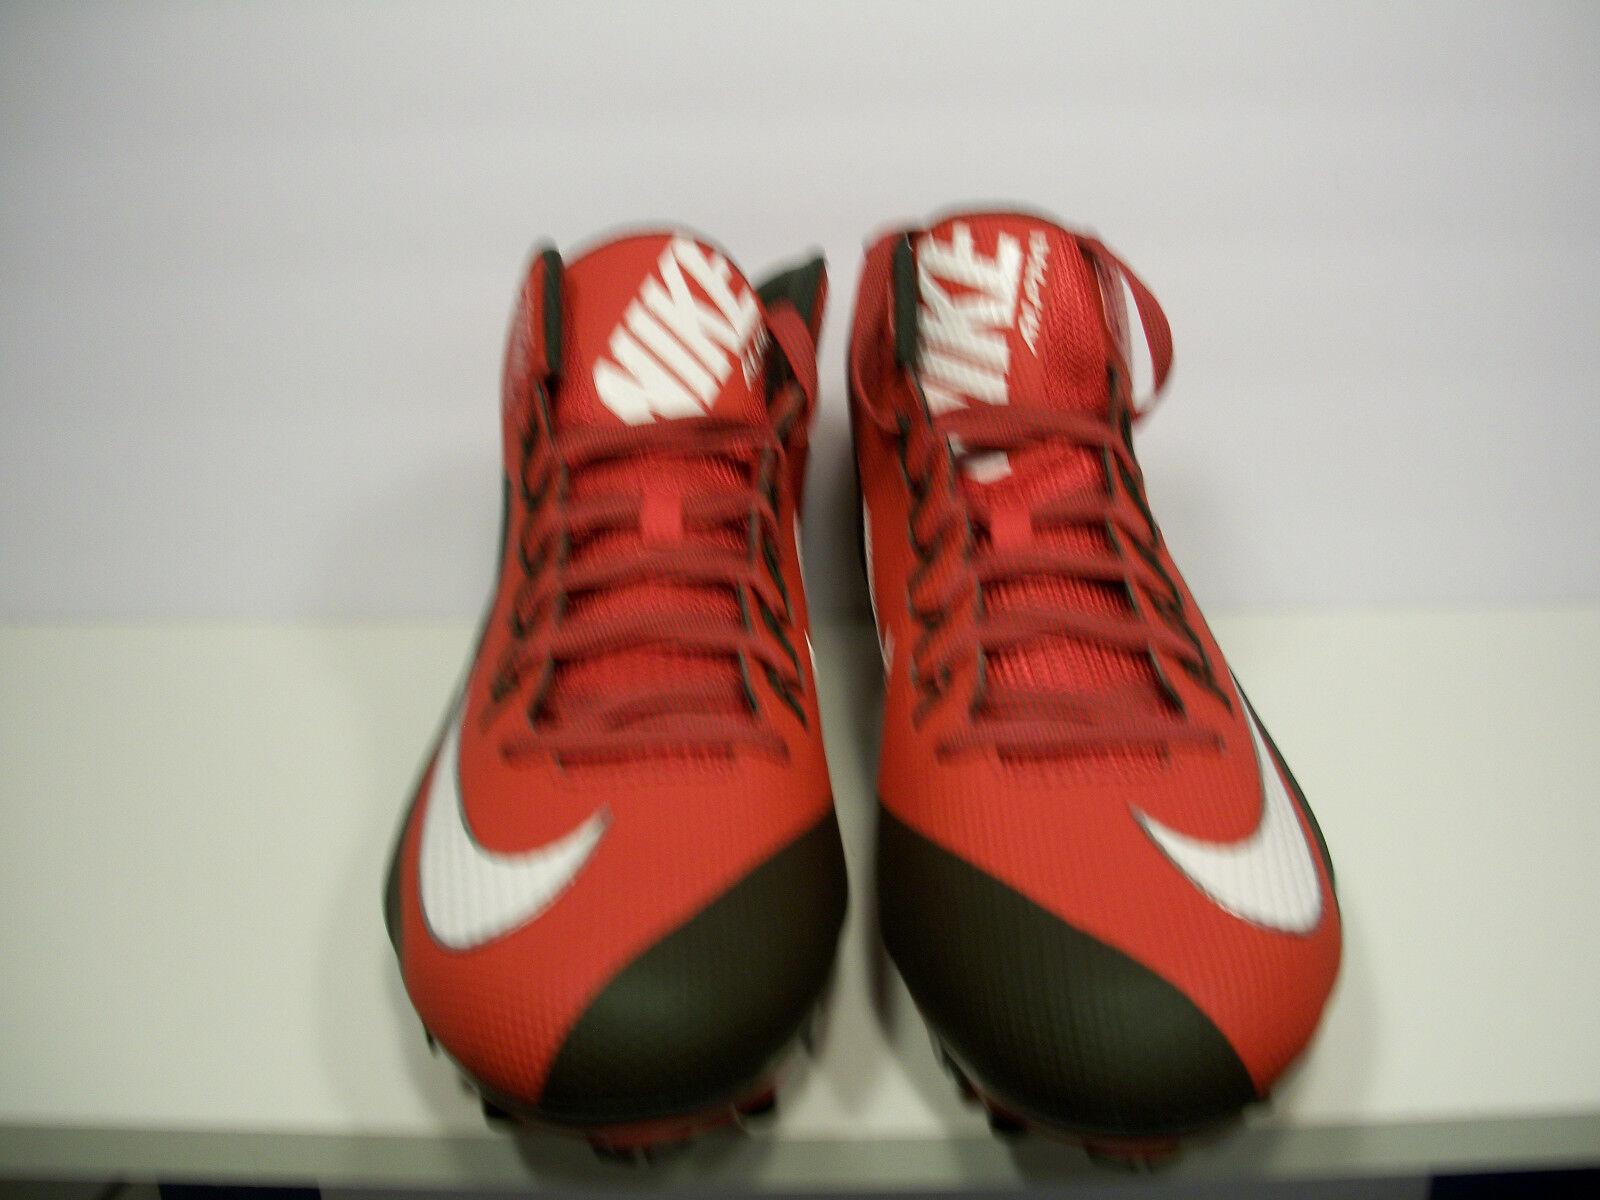 NIKE Alpha Pro II 3 4 TD Football Cleats Cleats Cleats Red Black 729444-630 Size 16 b06ce9